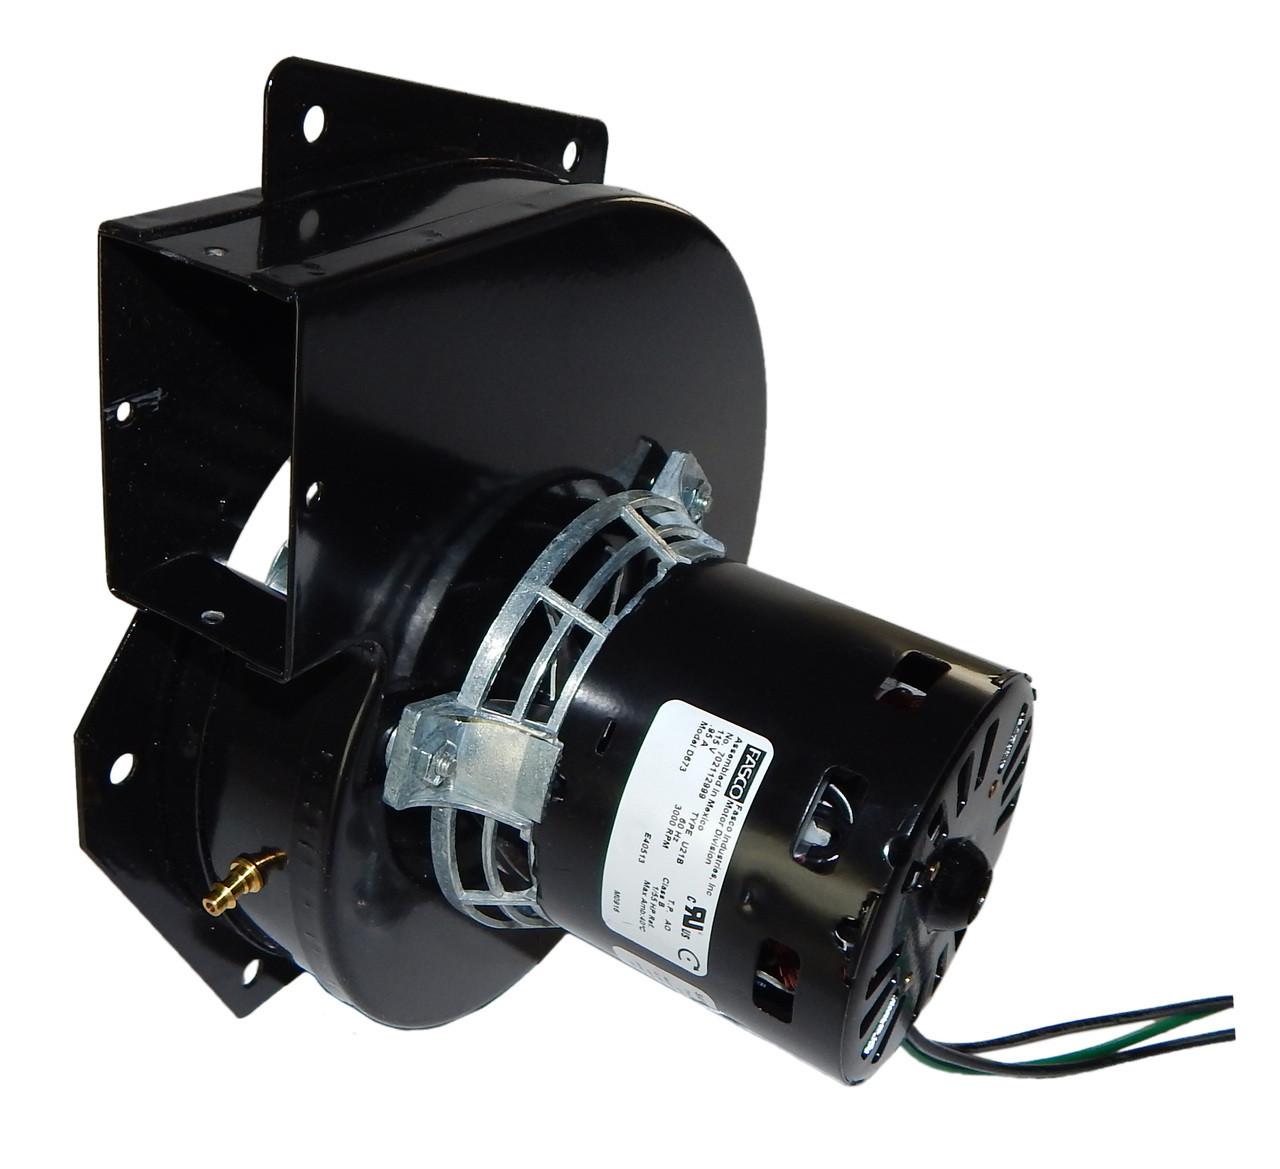 hight resolution of  manual d673 46064 1468505744 1280 1280 c 2 rgpn 05eauer wiring diagram rheem rgps rheem rudd furnace blower motors